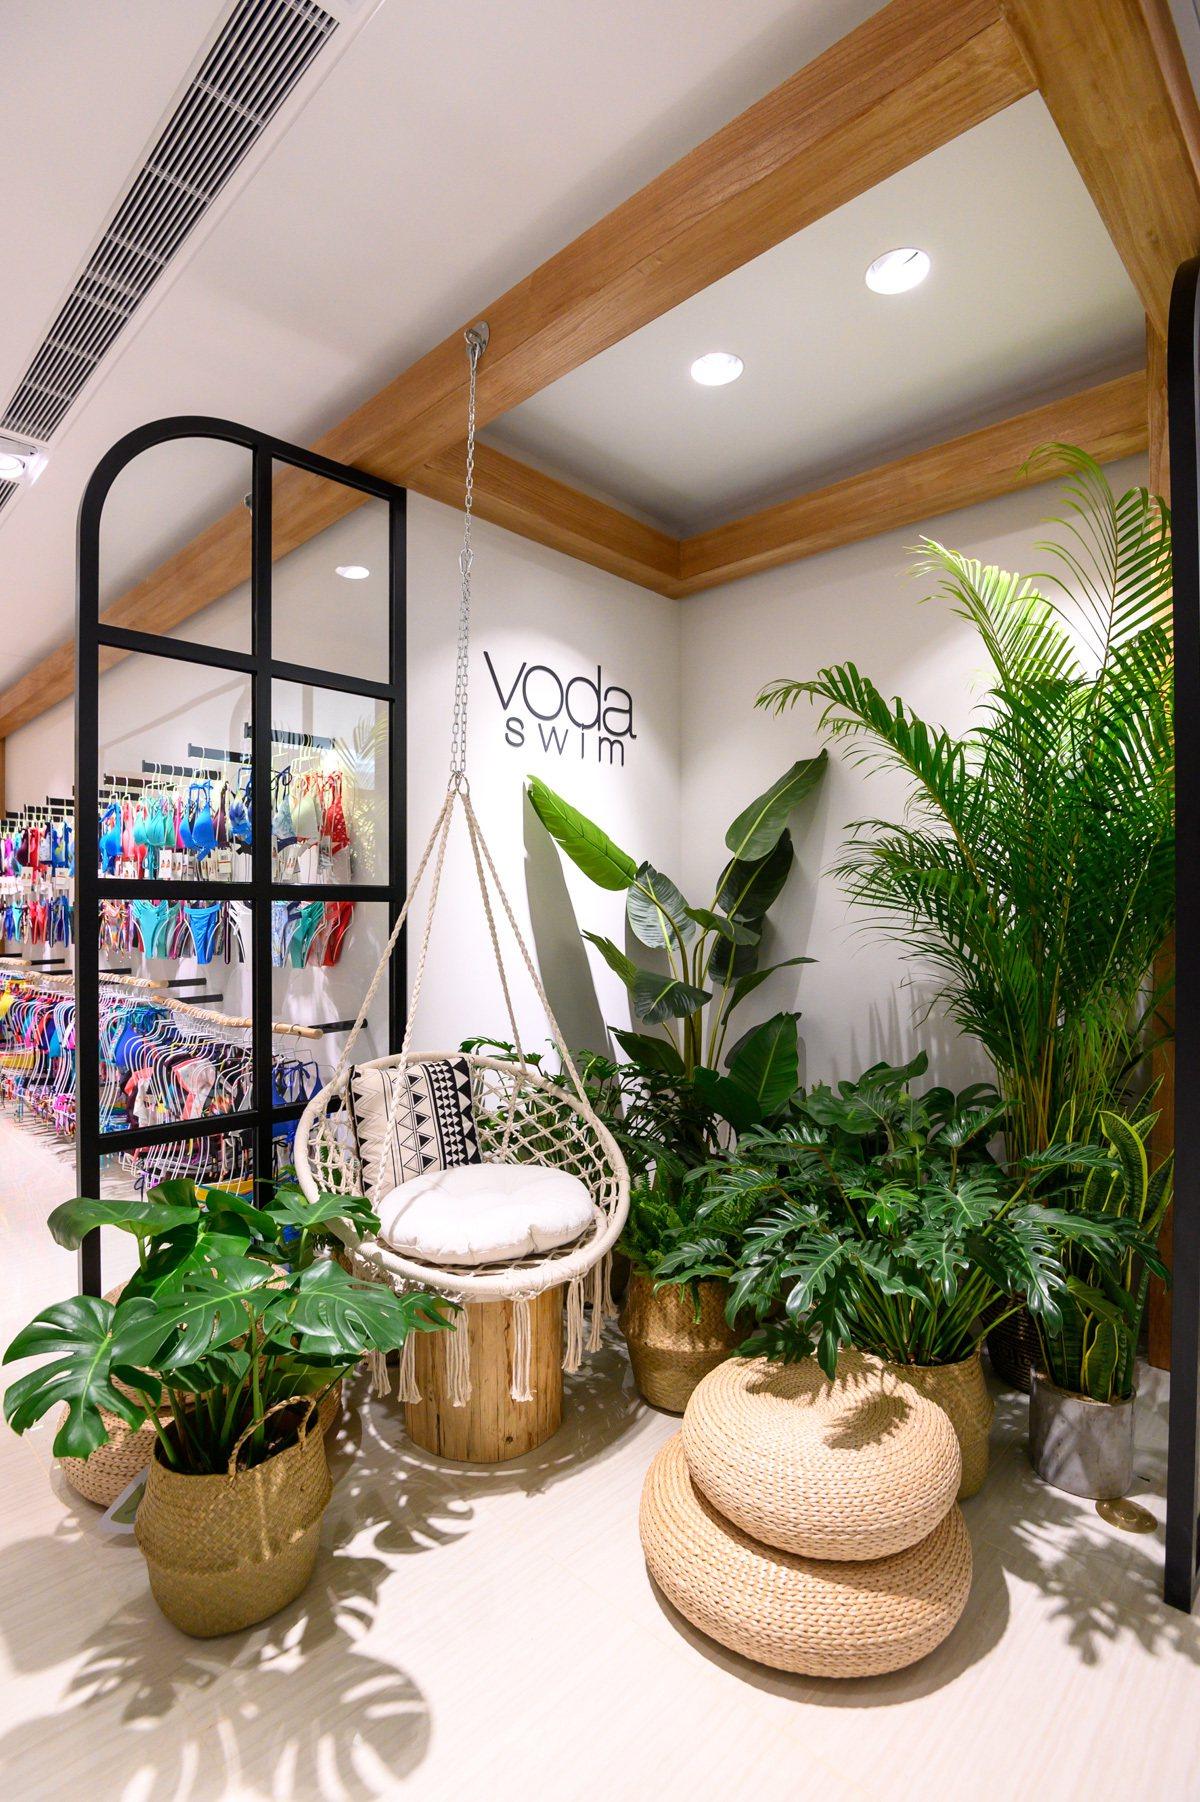 sunday遠百信義A13渡假概念店有著充滿熱帶風情的店裝。圖/sunday提供